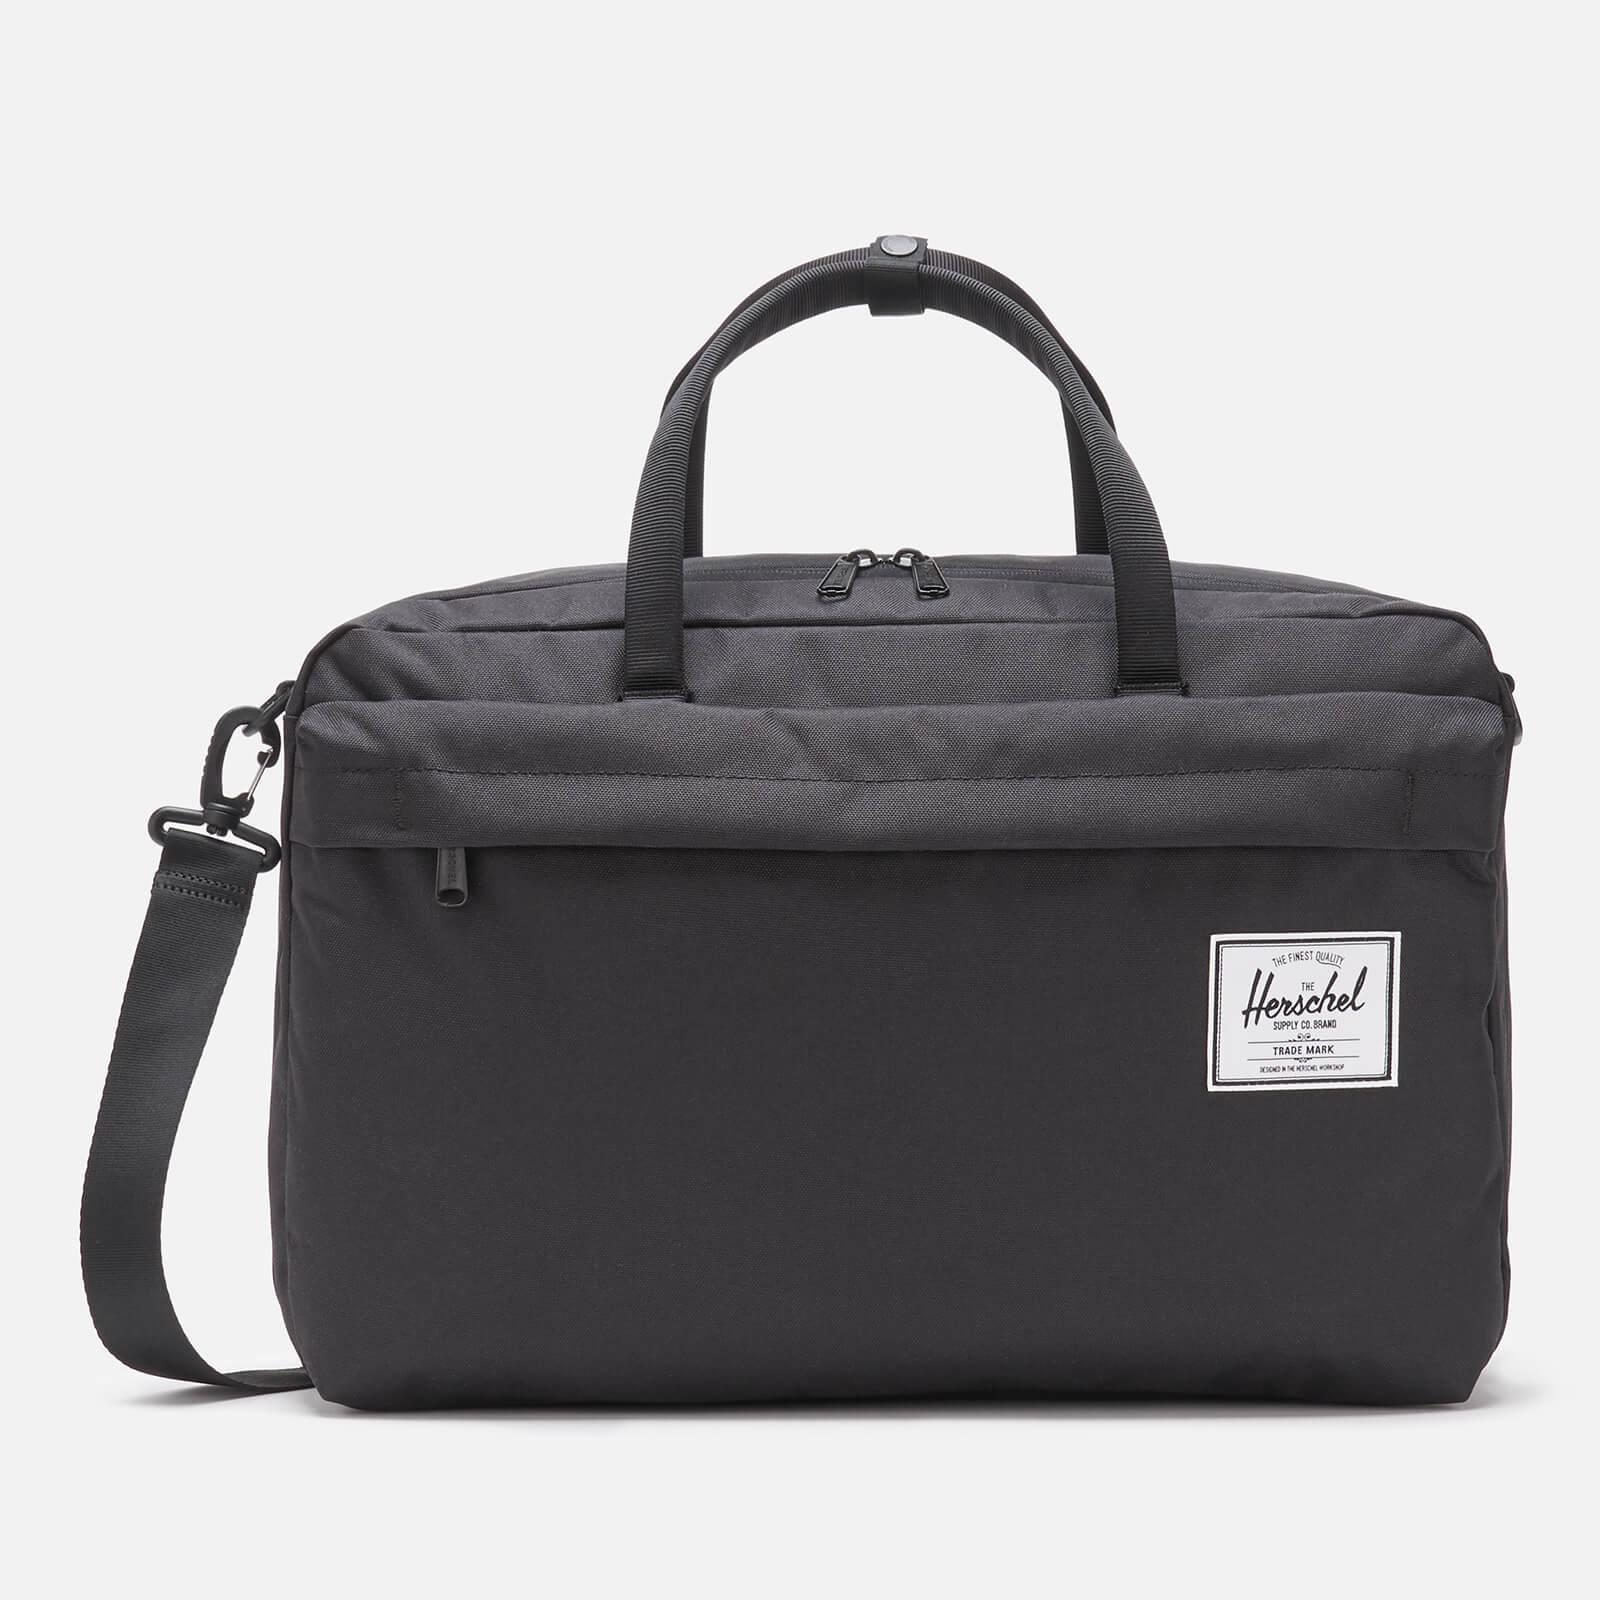 Herschel Supply Co. Men's Bowen Laptop Bag - Black